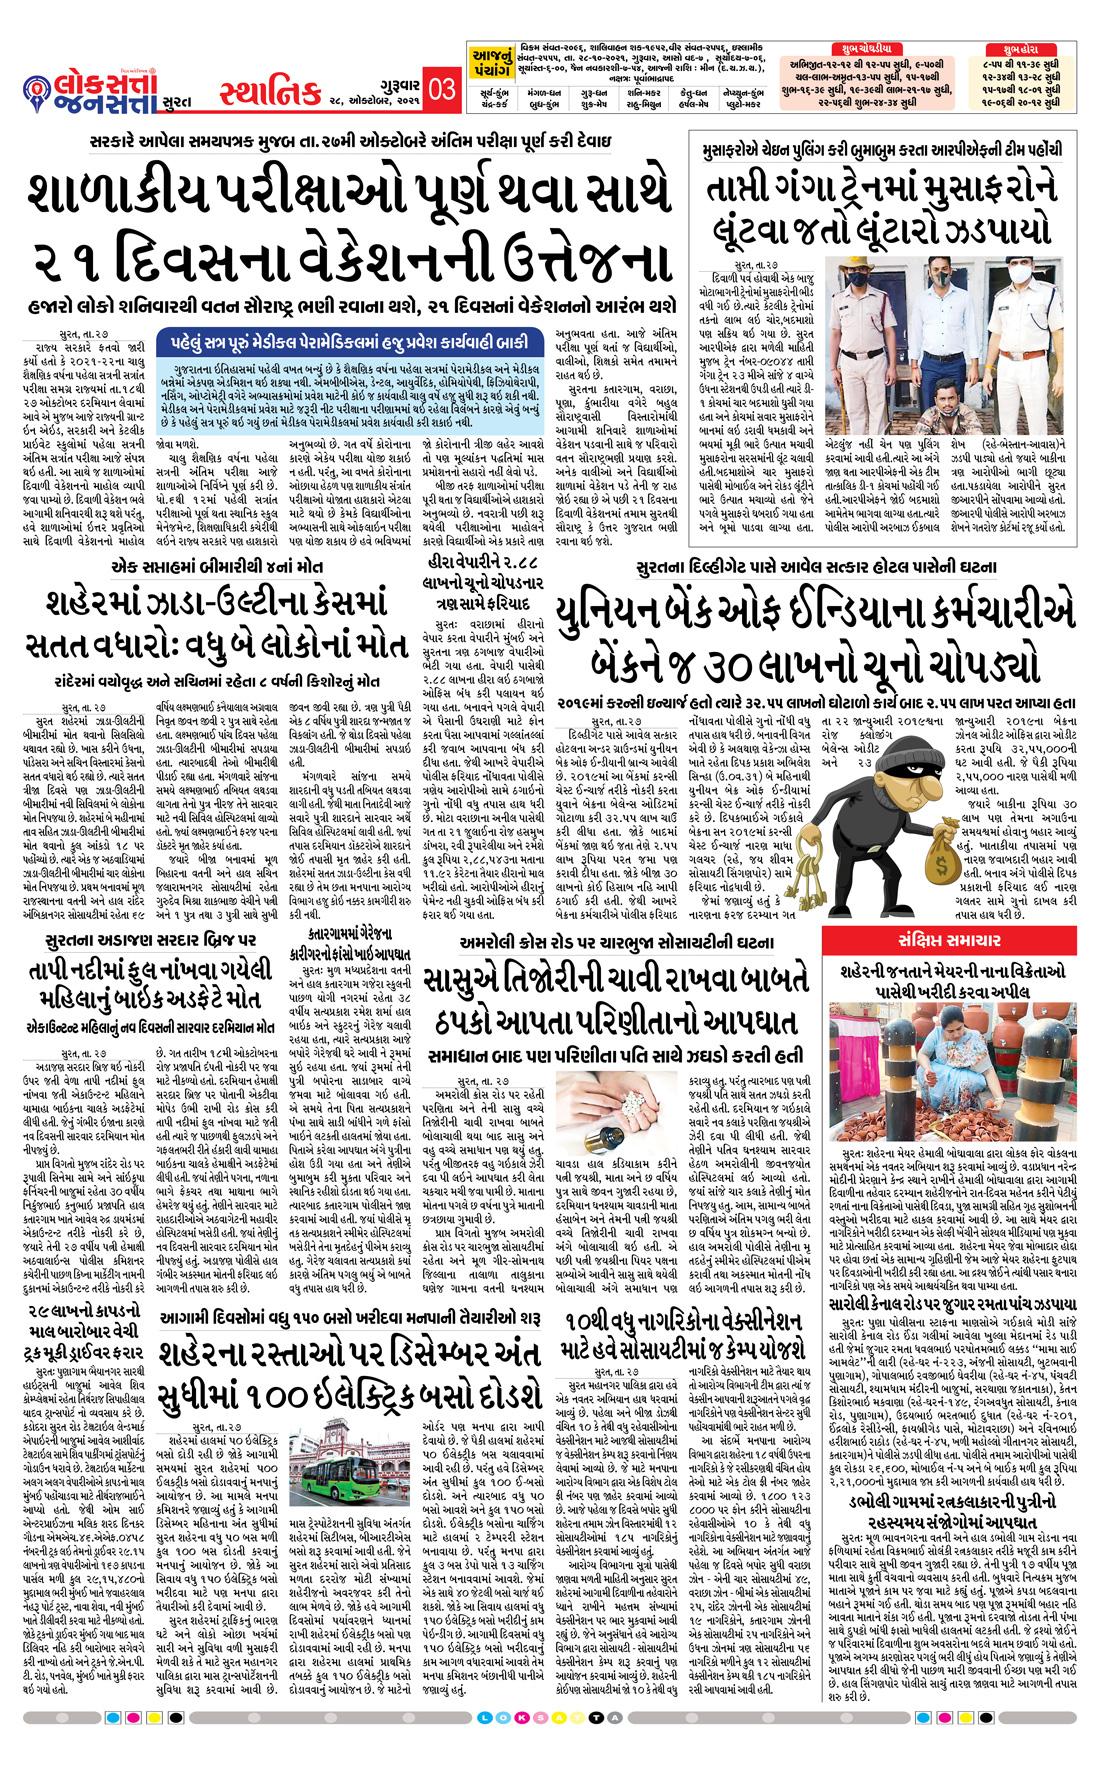 Loksatta Jansatta News Papaer E-paper dated 2021-10-28   Page 3